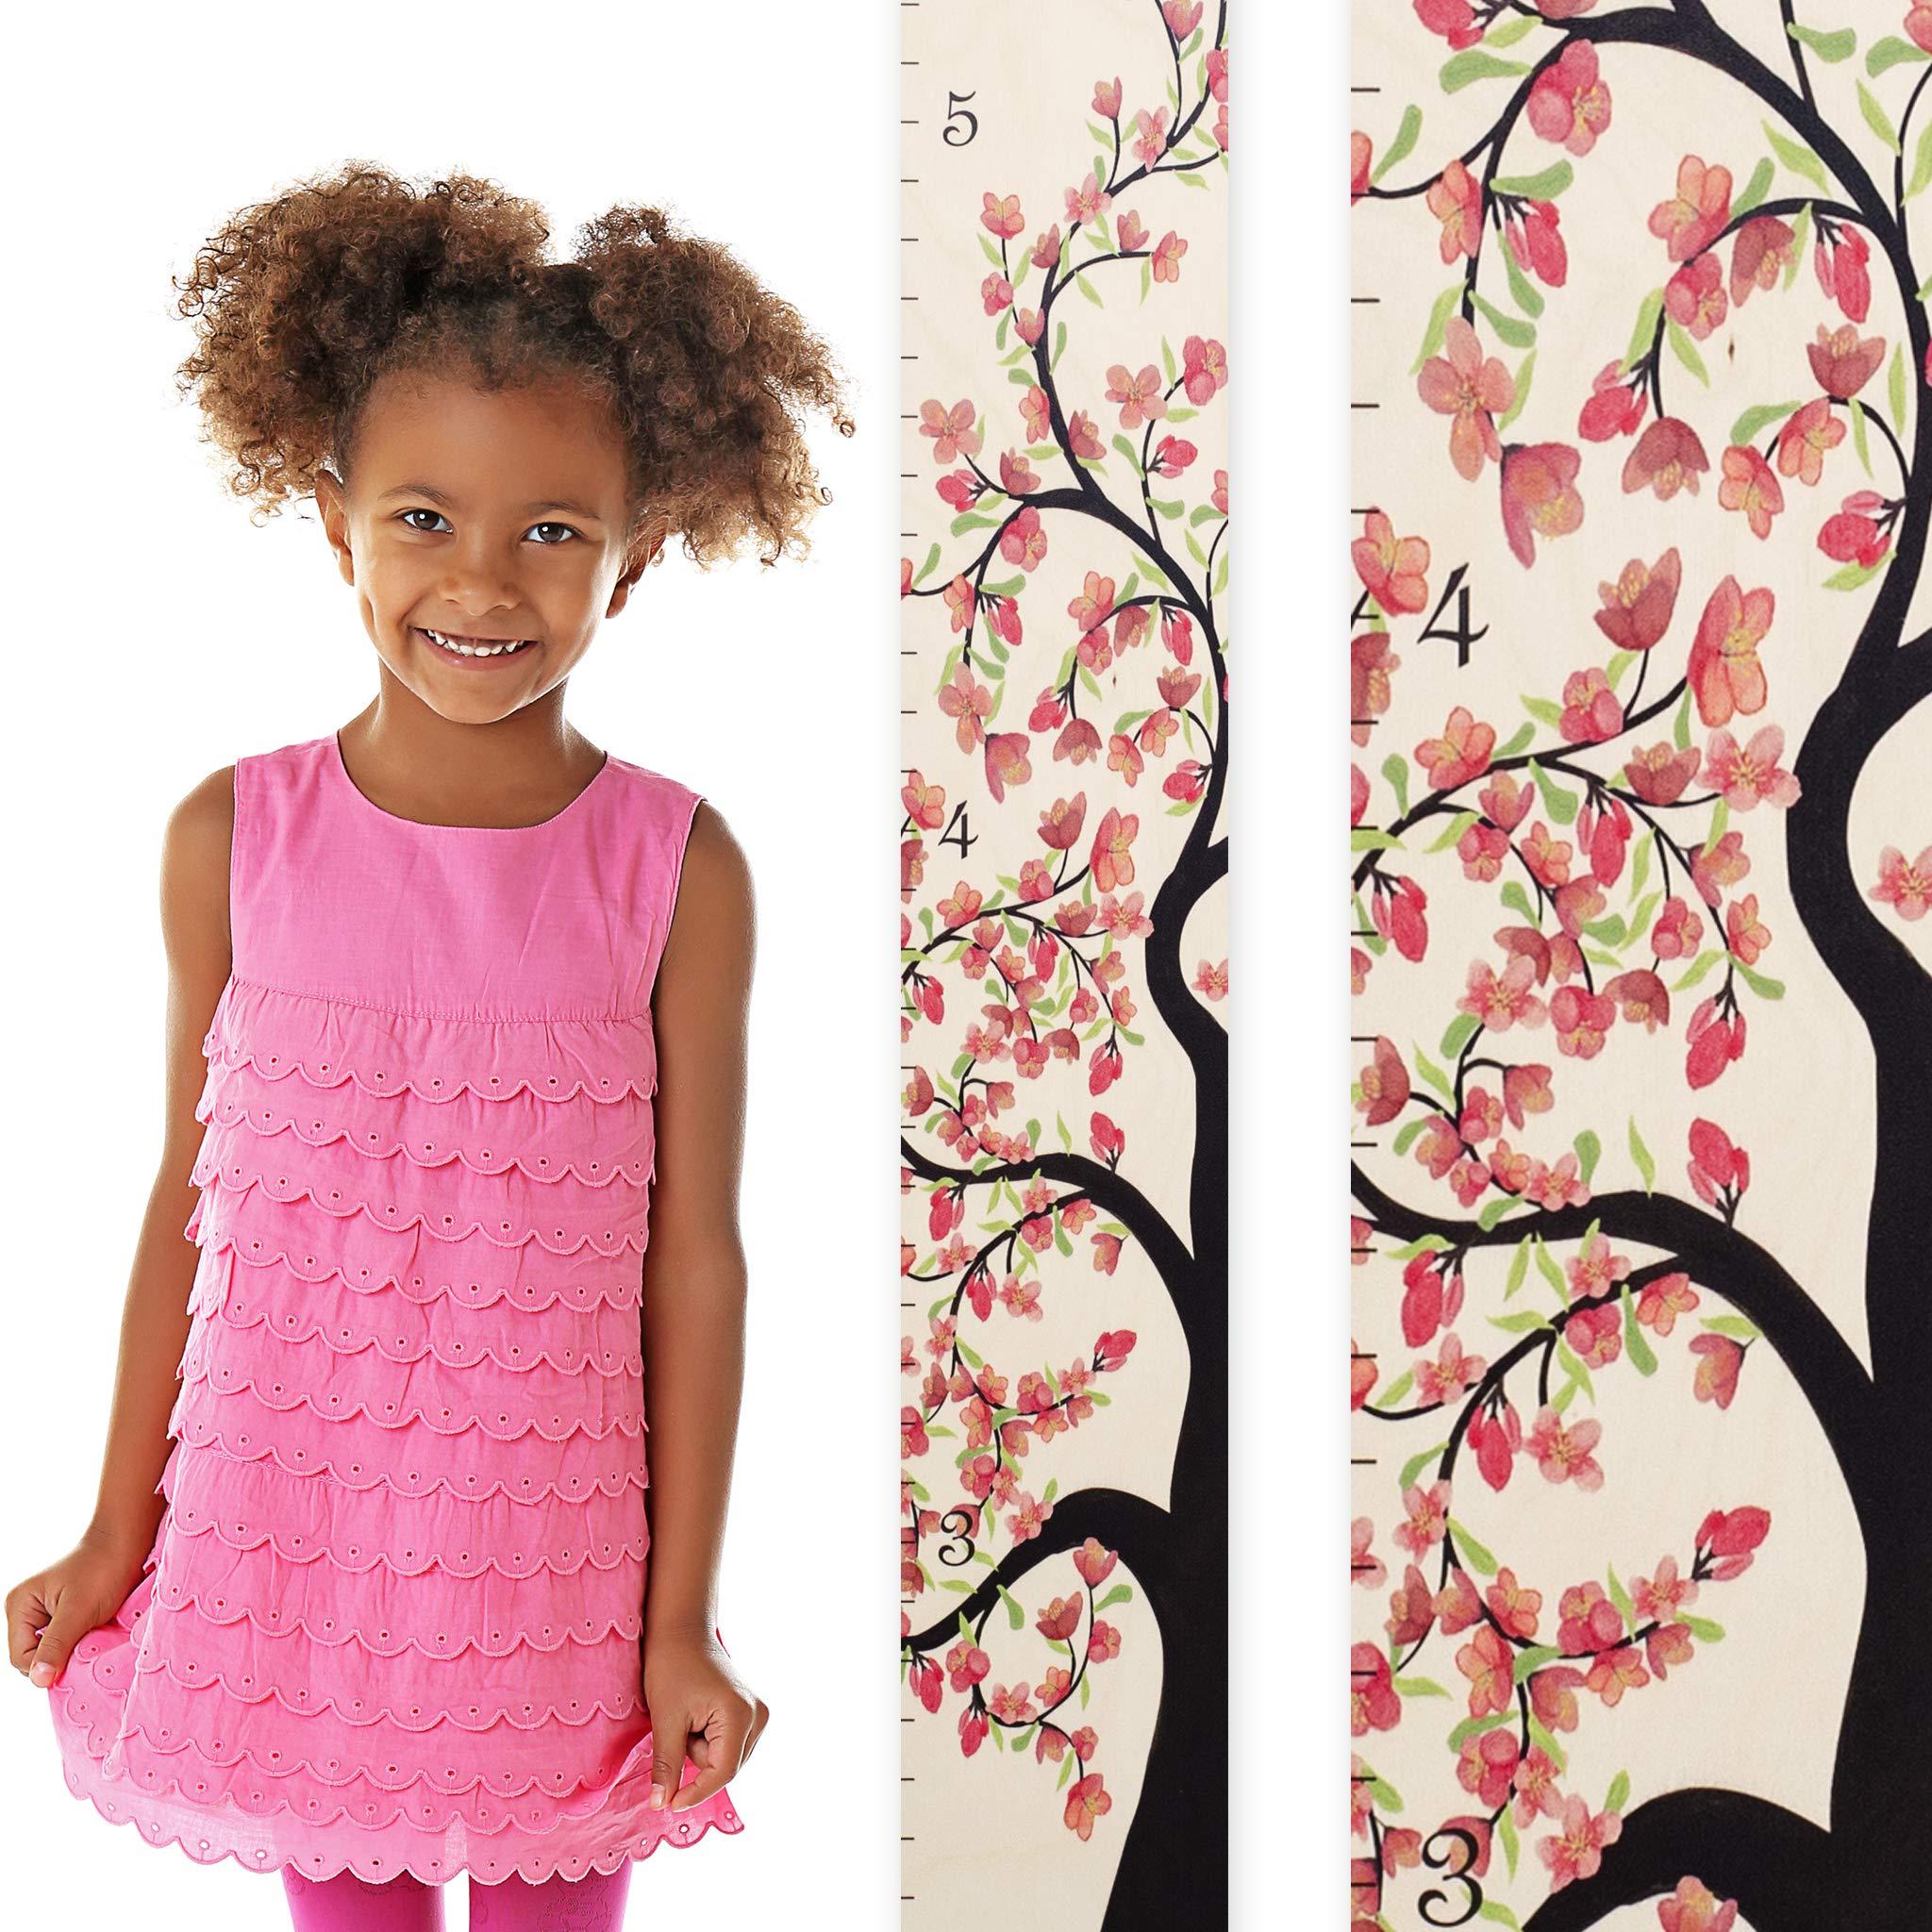 Growth Chart Art   Wooden Growth Chart Girls   Measuring Kids Height Wall Décor   Flower Growth Chart Ruler   Tree of Life Pink